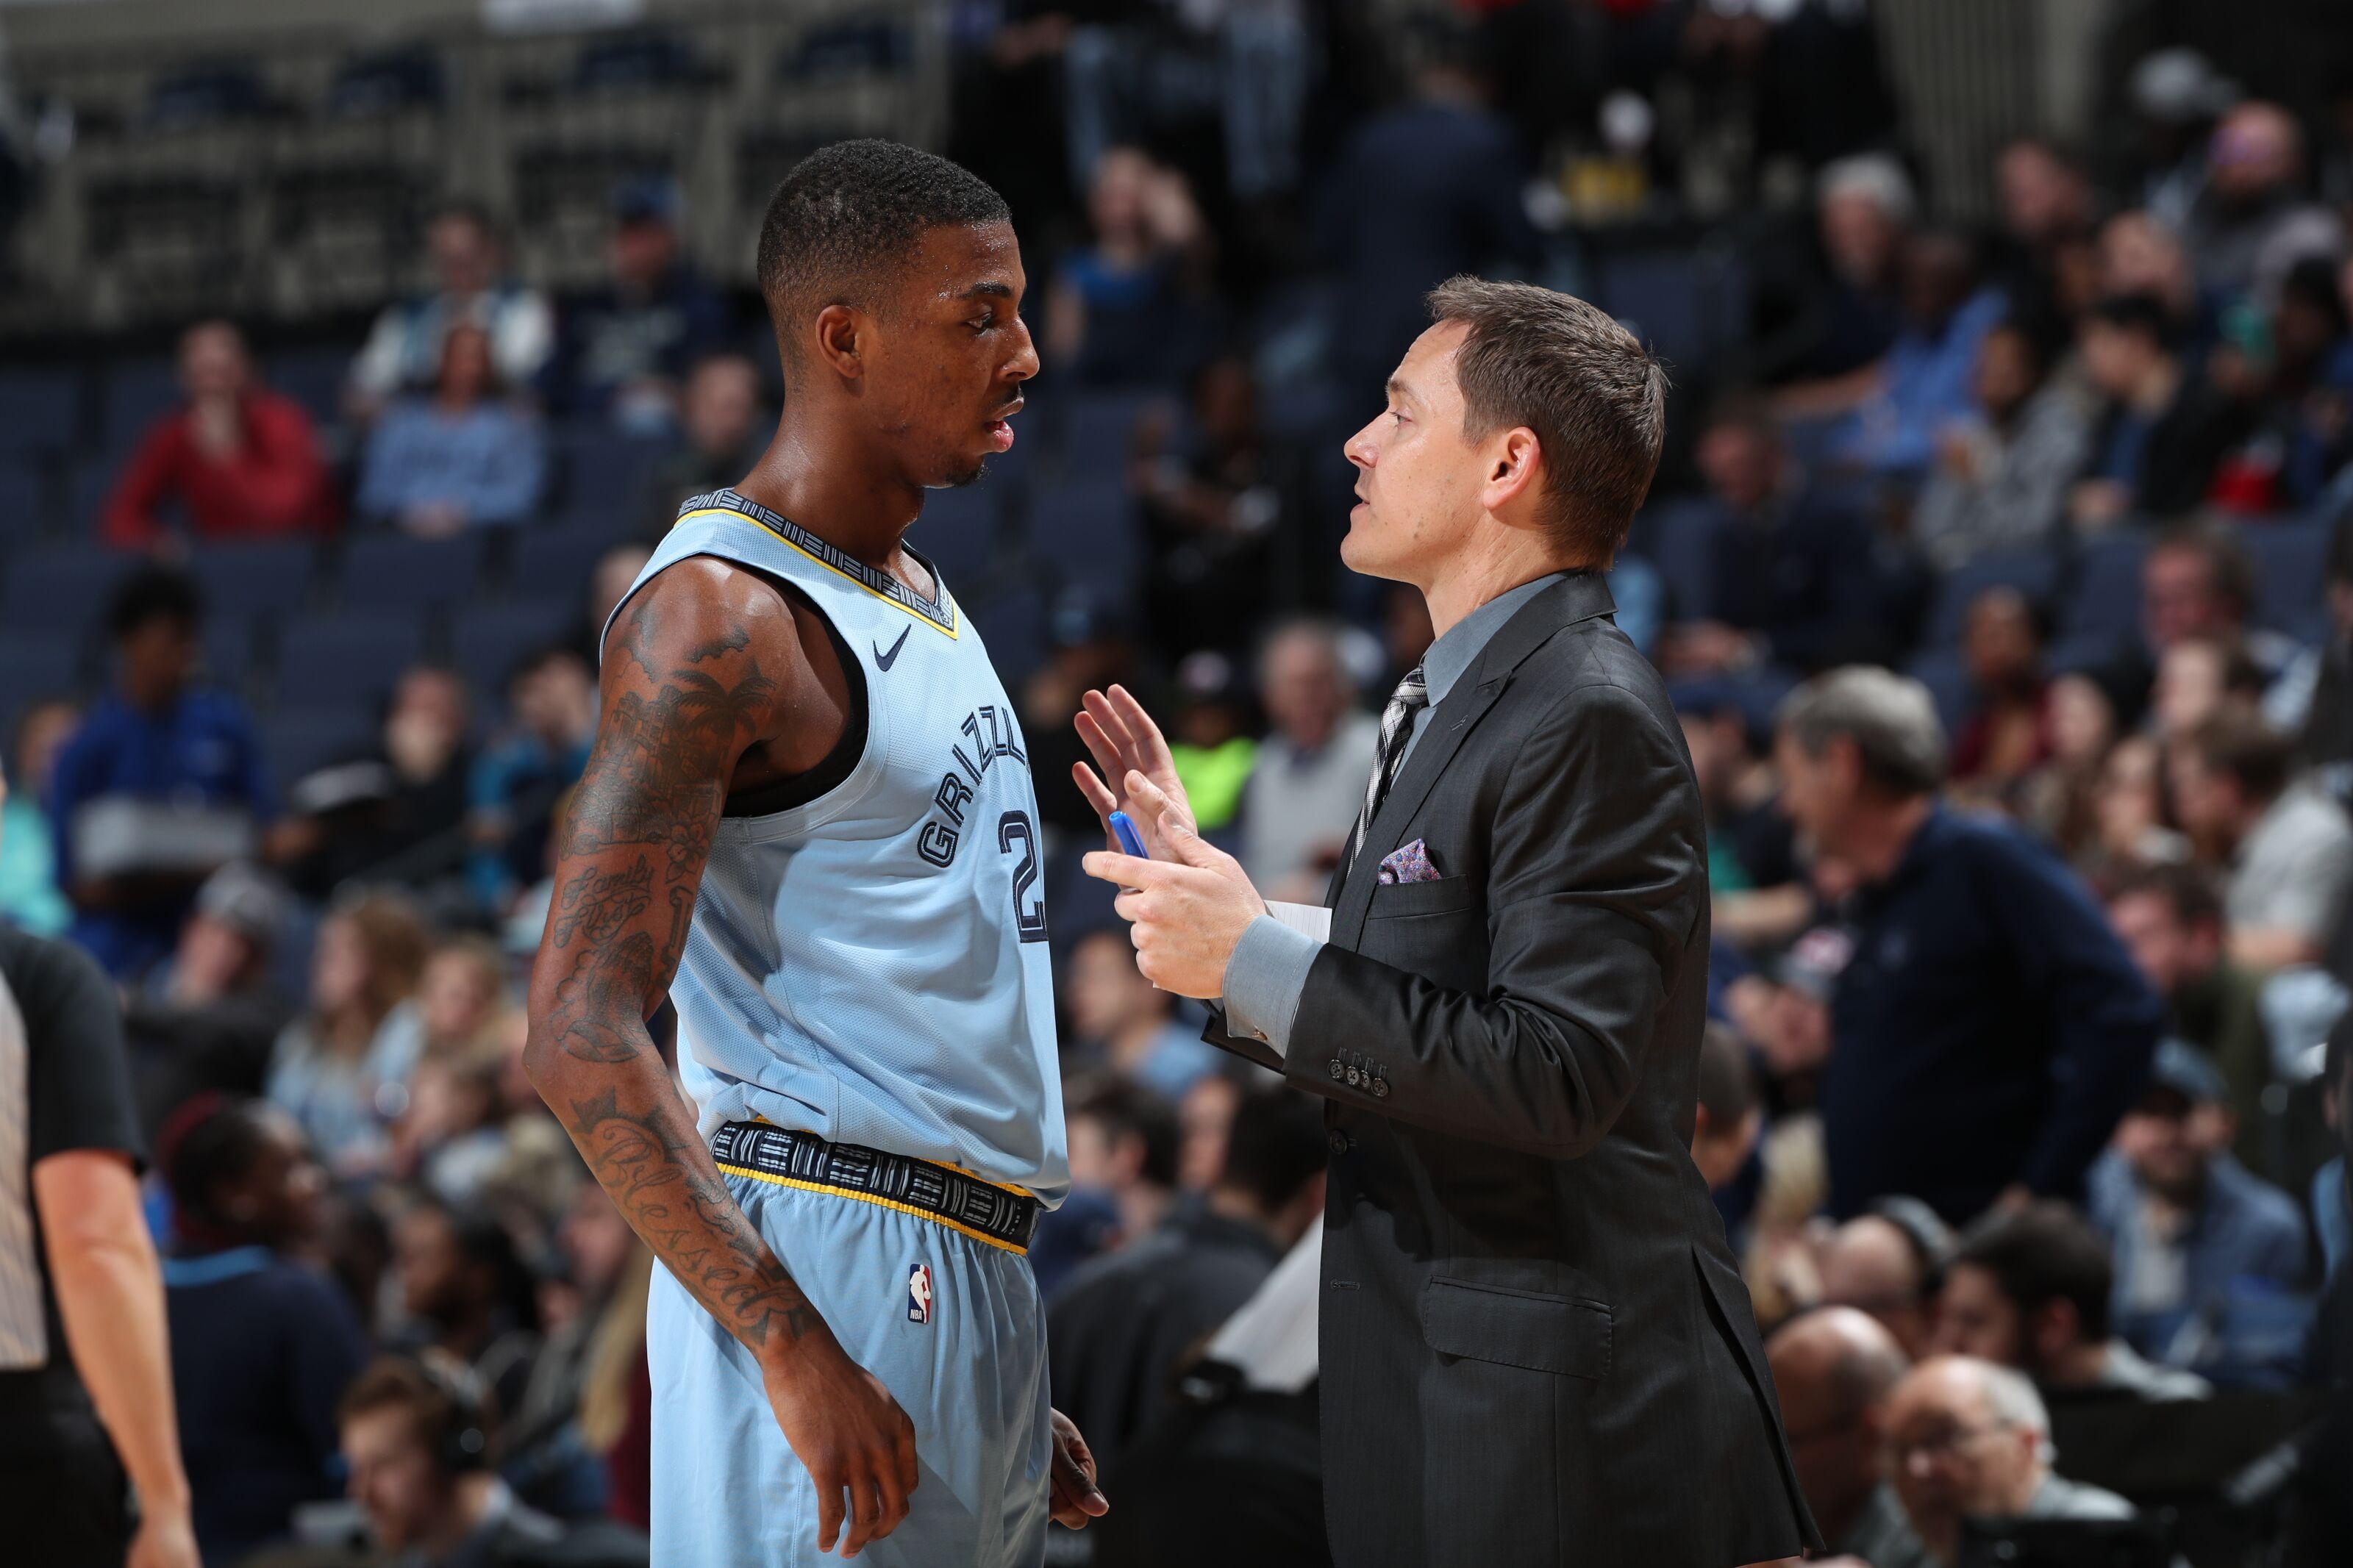 Milwaukee Bucks Daily: Bucks to reportedly add Chad Forcier to coaching staff